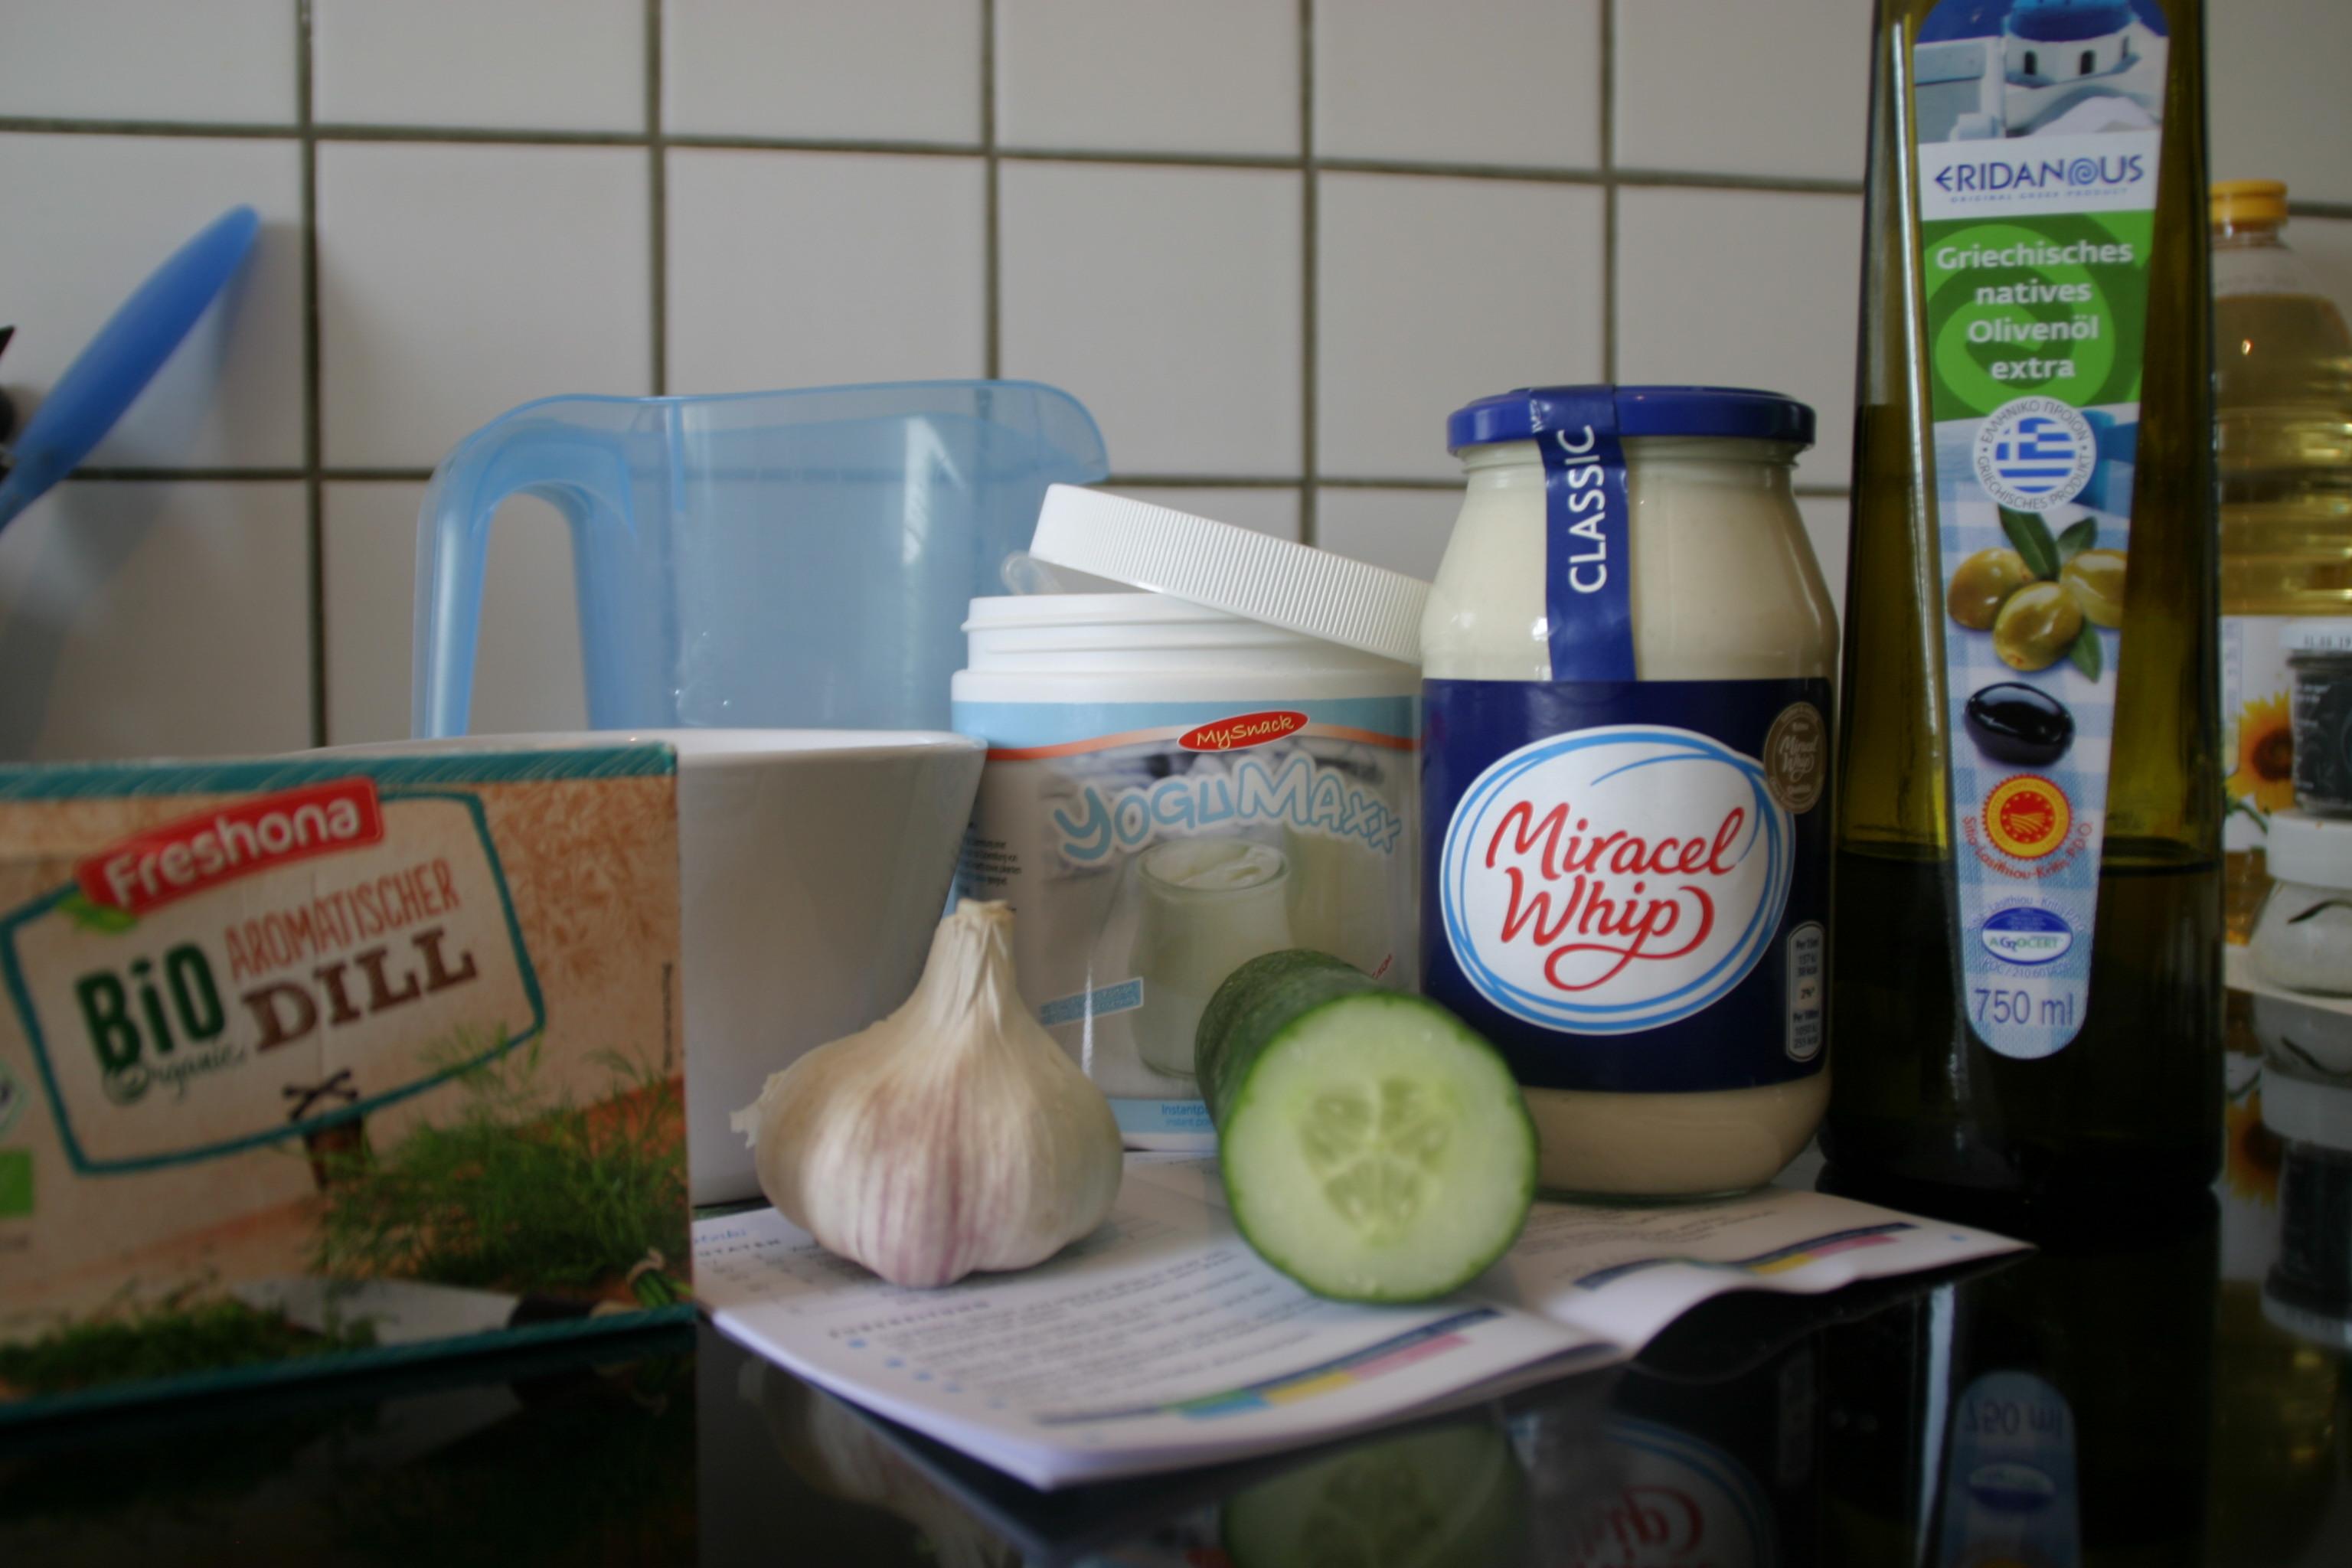 yogumaxx ohne reue joghurt schlemmen plus tzatziki rezept. Black Bedroom Furniture Sets. Home Design Ideas